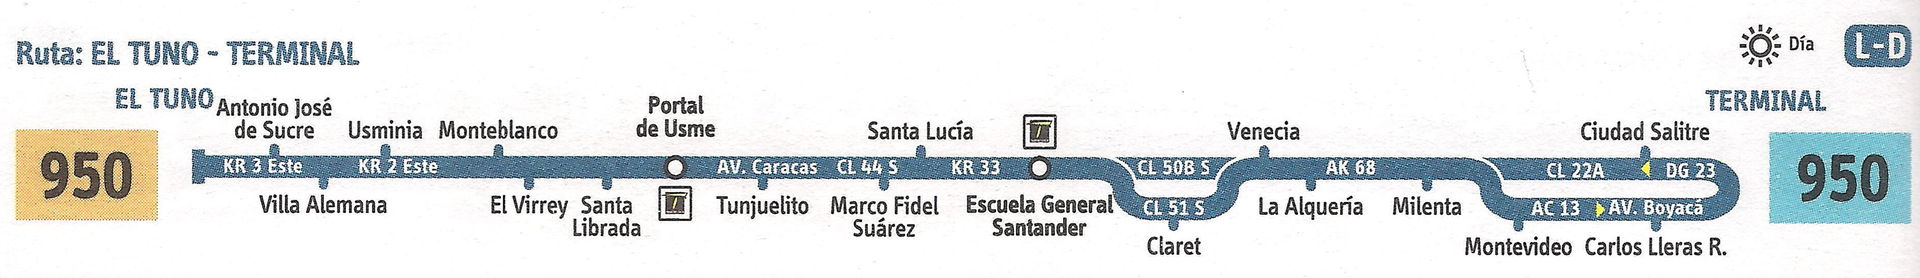 Ruta SITP: 950 El Tuno ↔ Terminal (Recortada hasta Venecia) [Urbana] 2